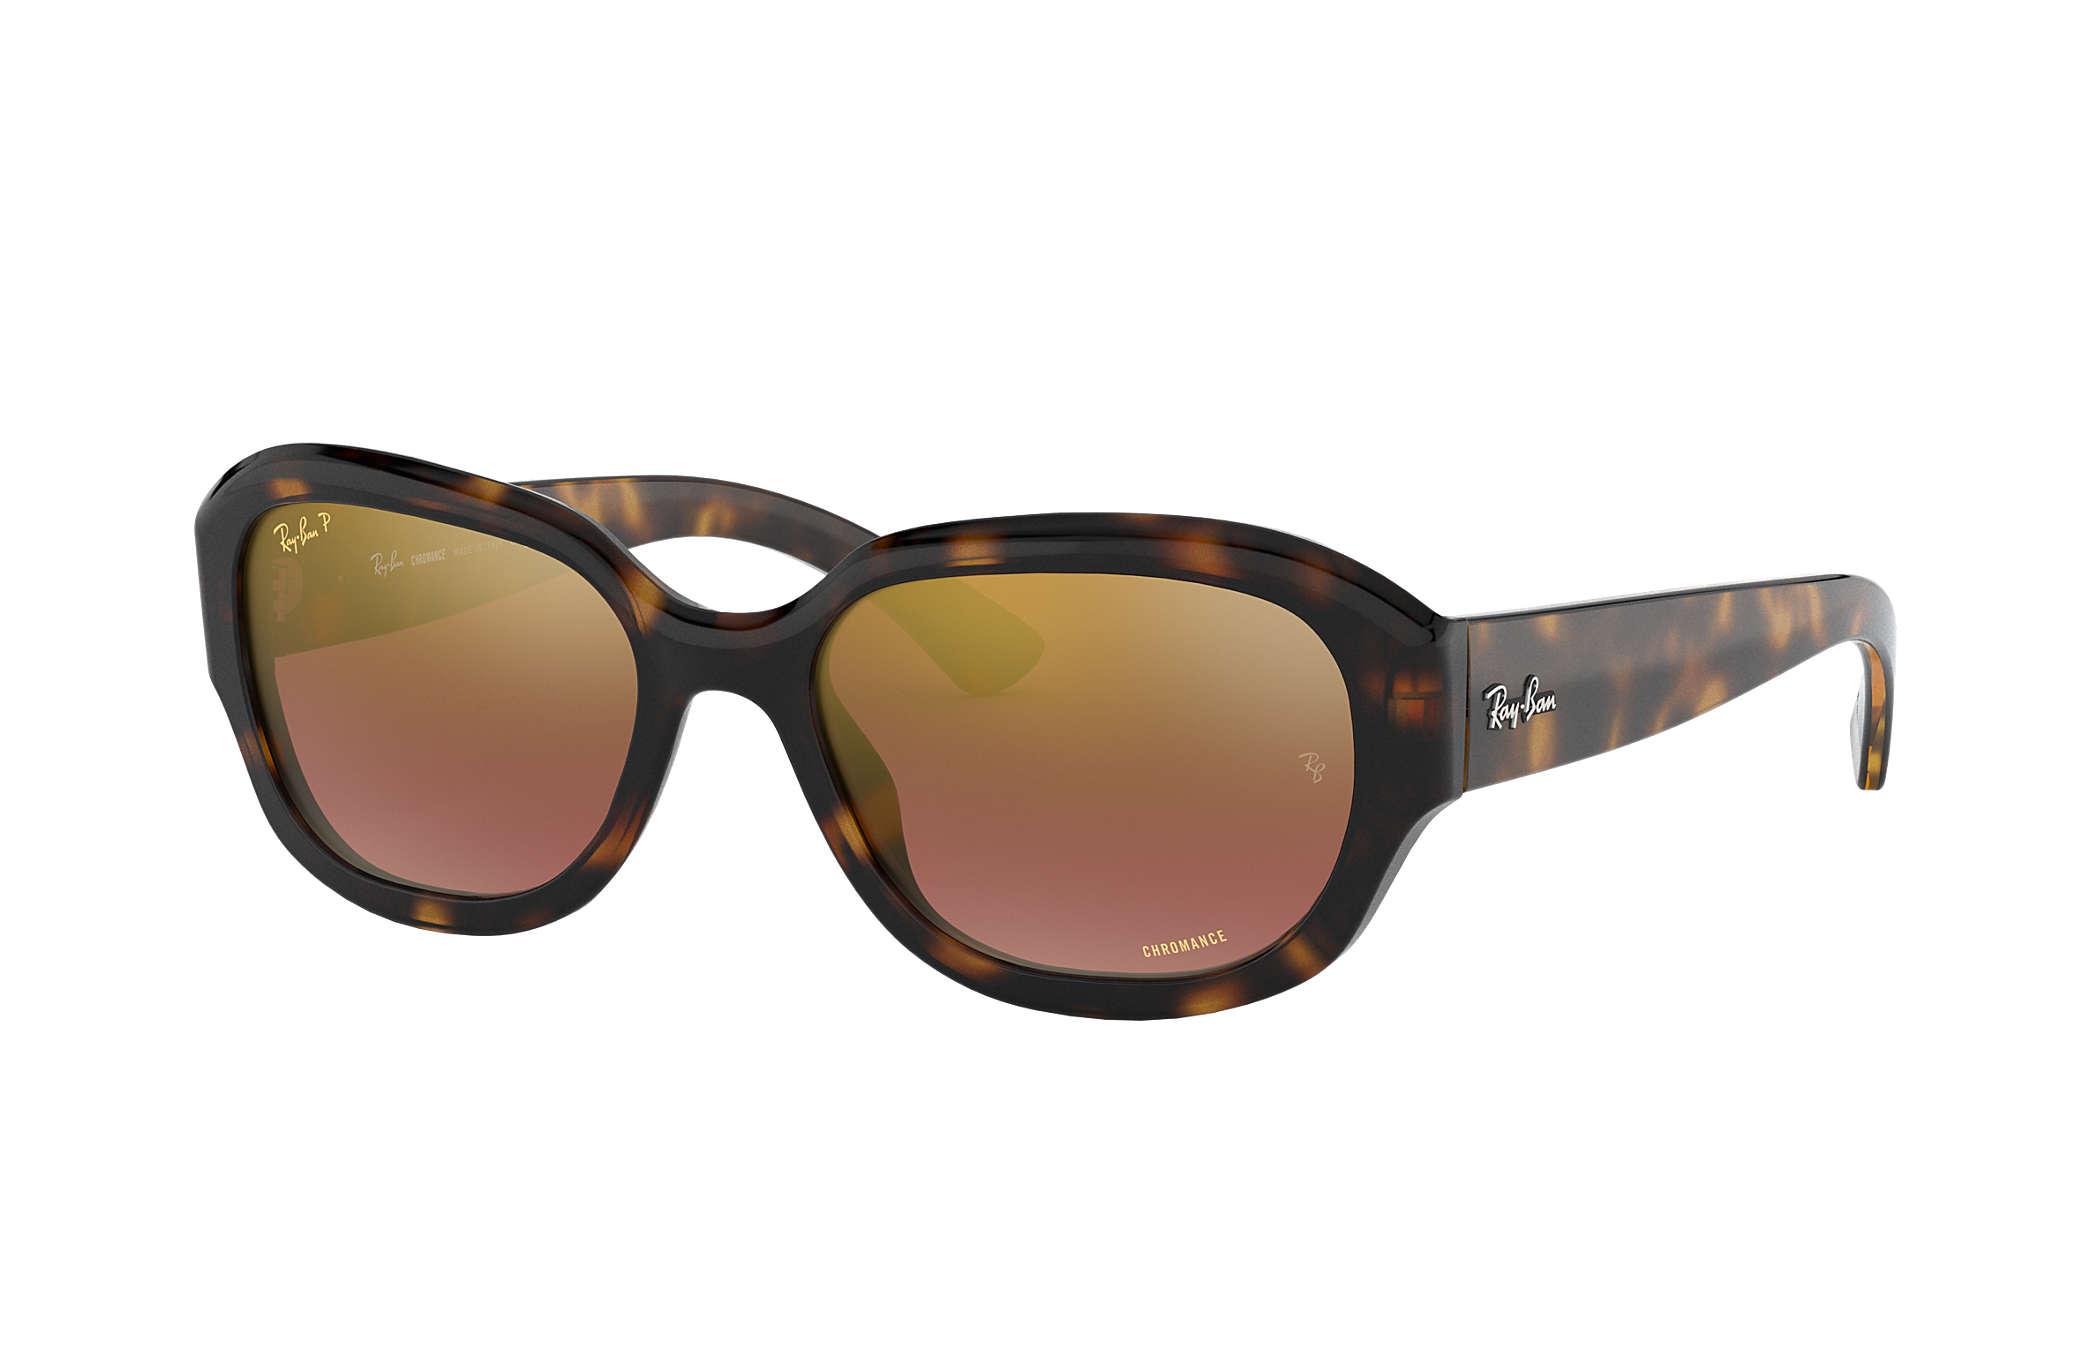 a5935a7161 Ray Ban Nylor Sport Sunglasses « Heritage Malta